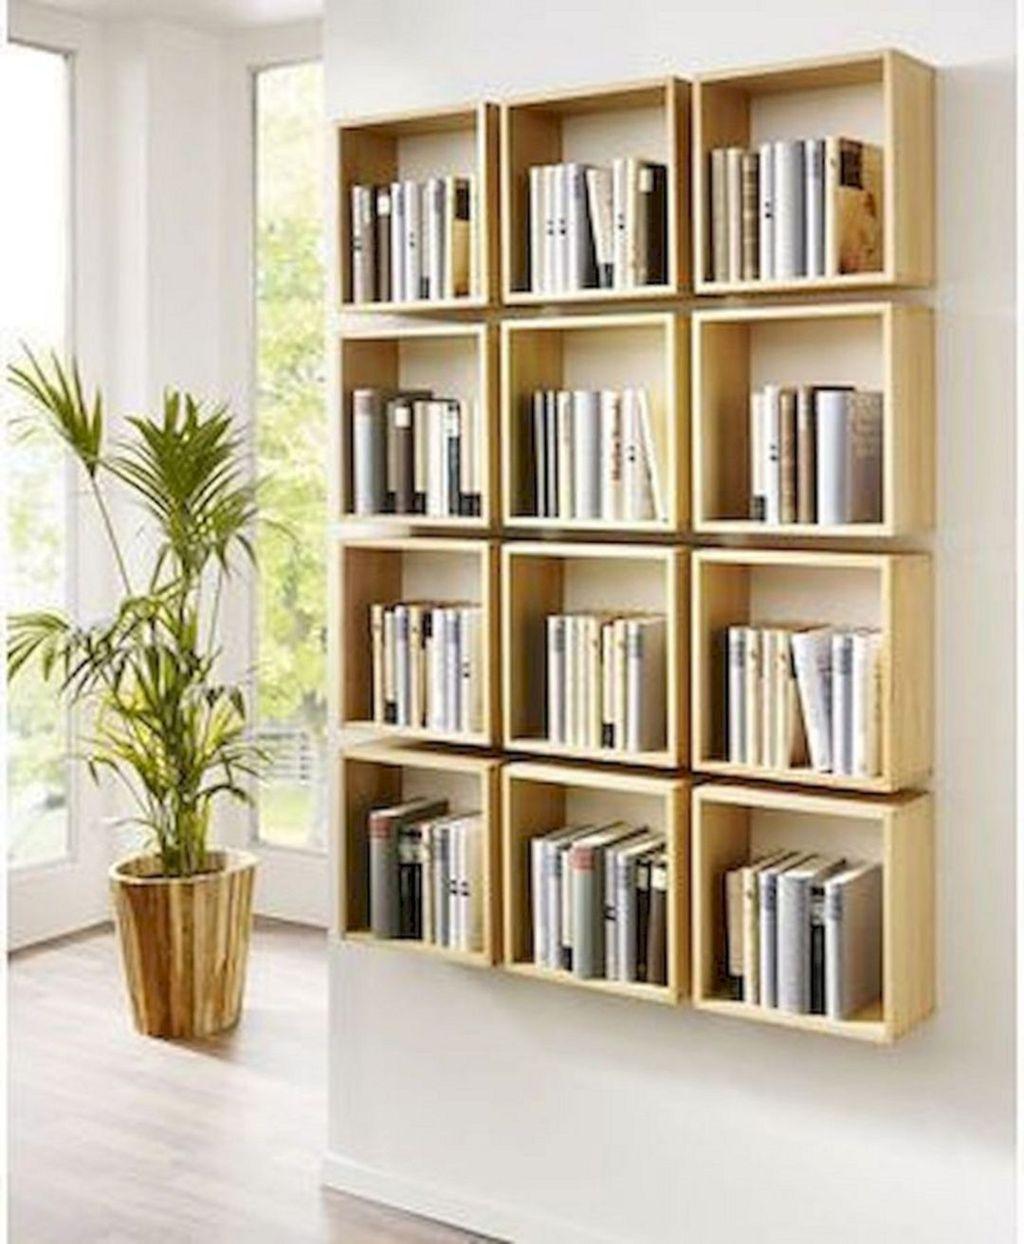 Fabulous Bookshelf Design Ideas For Your Interior Decor 12